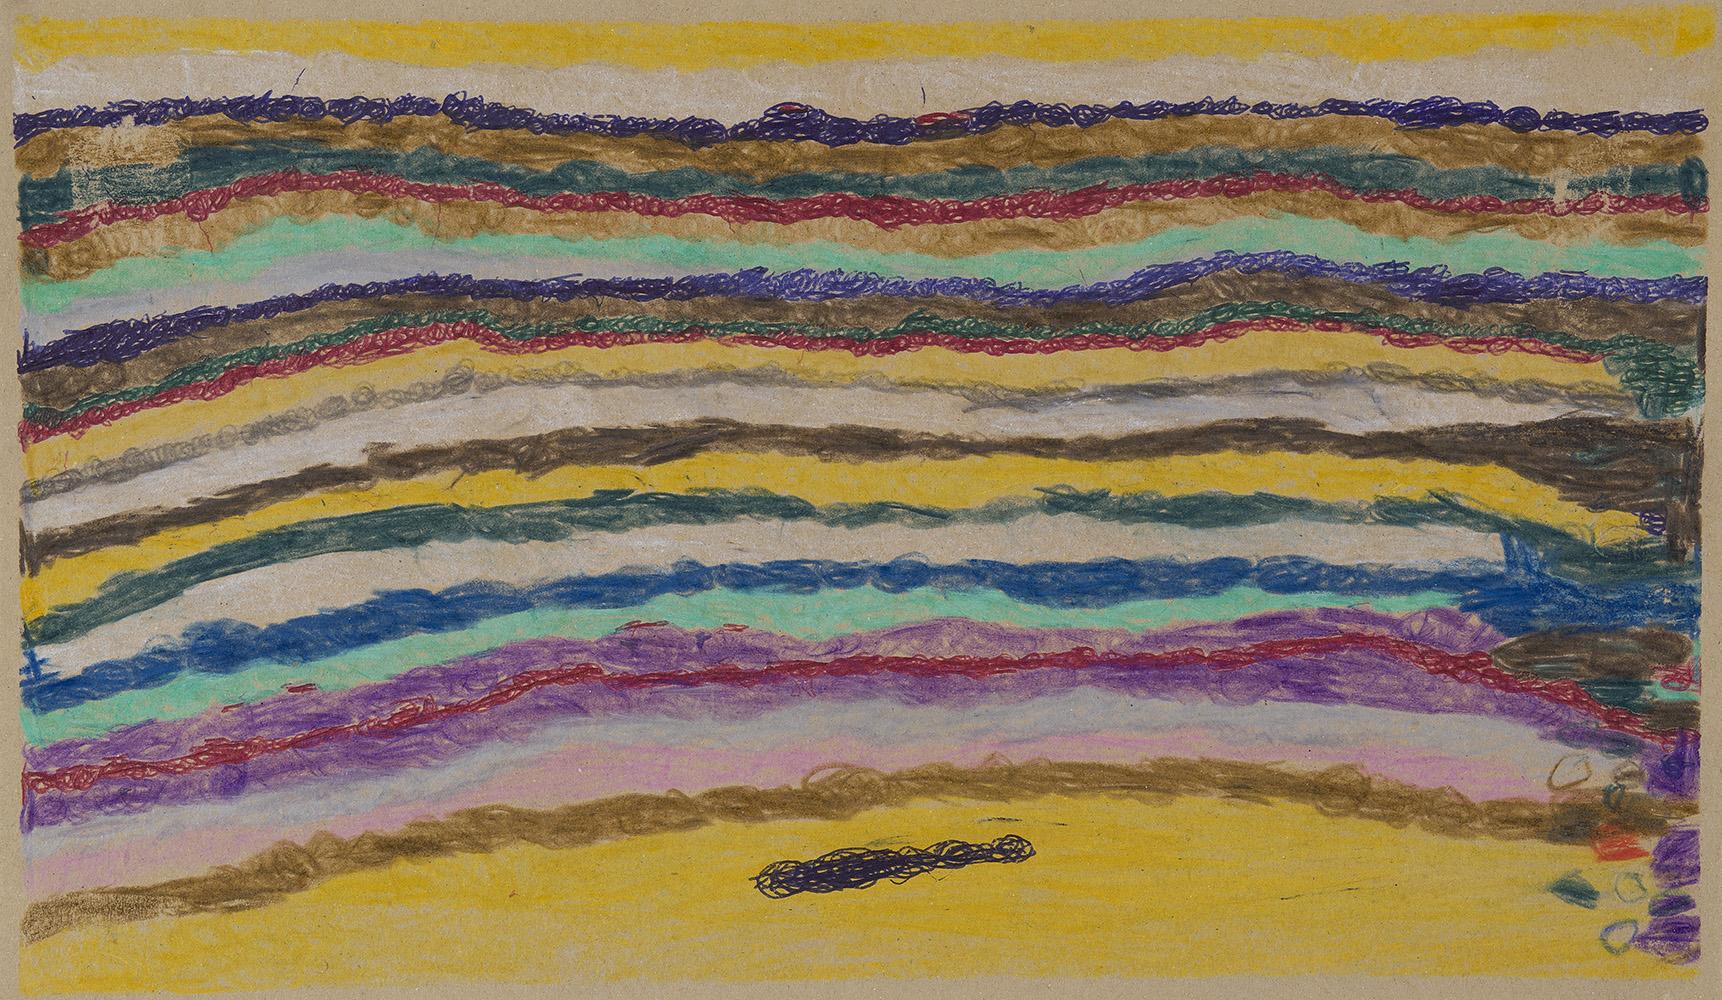 Joseph Lambert    Untitled  , 2012 Mixed media on cardboard 8.5 x 14.49 inches 21.6 x 36.8 cm JLam 4